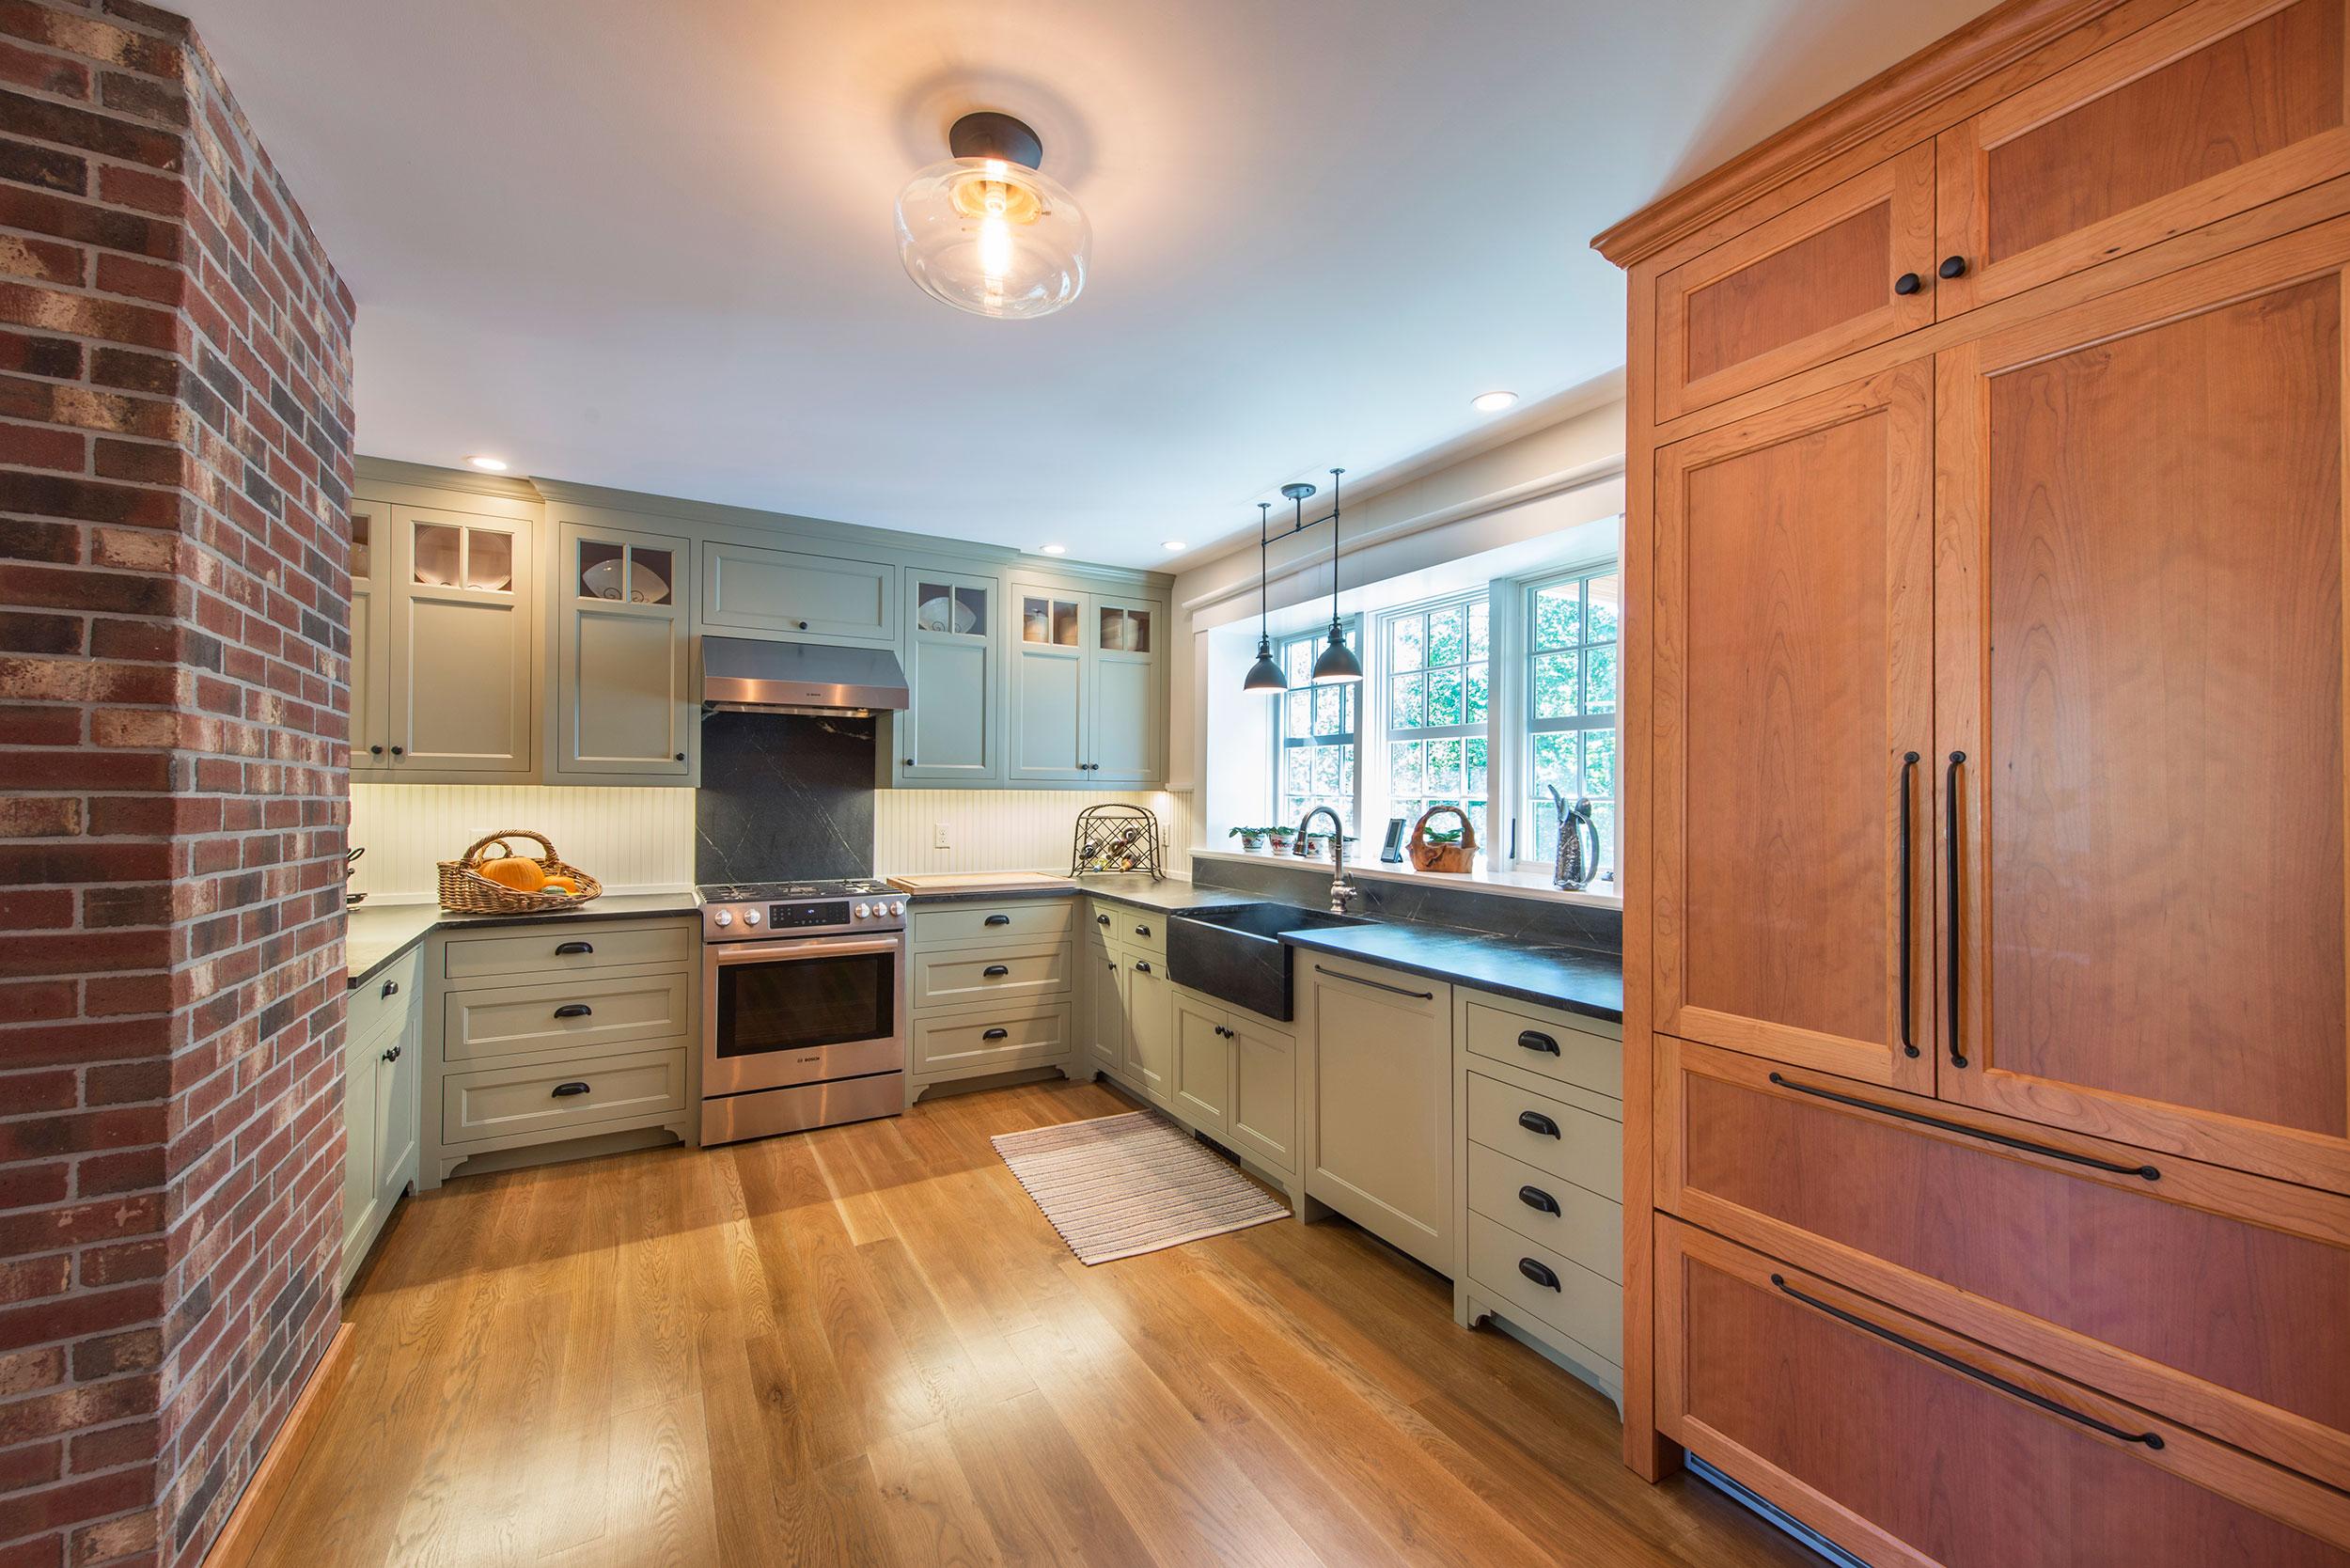 Rennovated-Historic-Kitchen-DSC0056.jpg